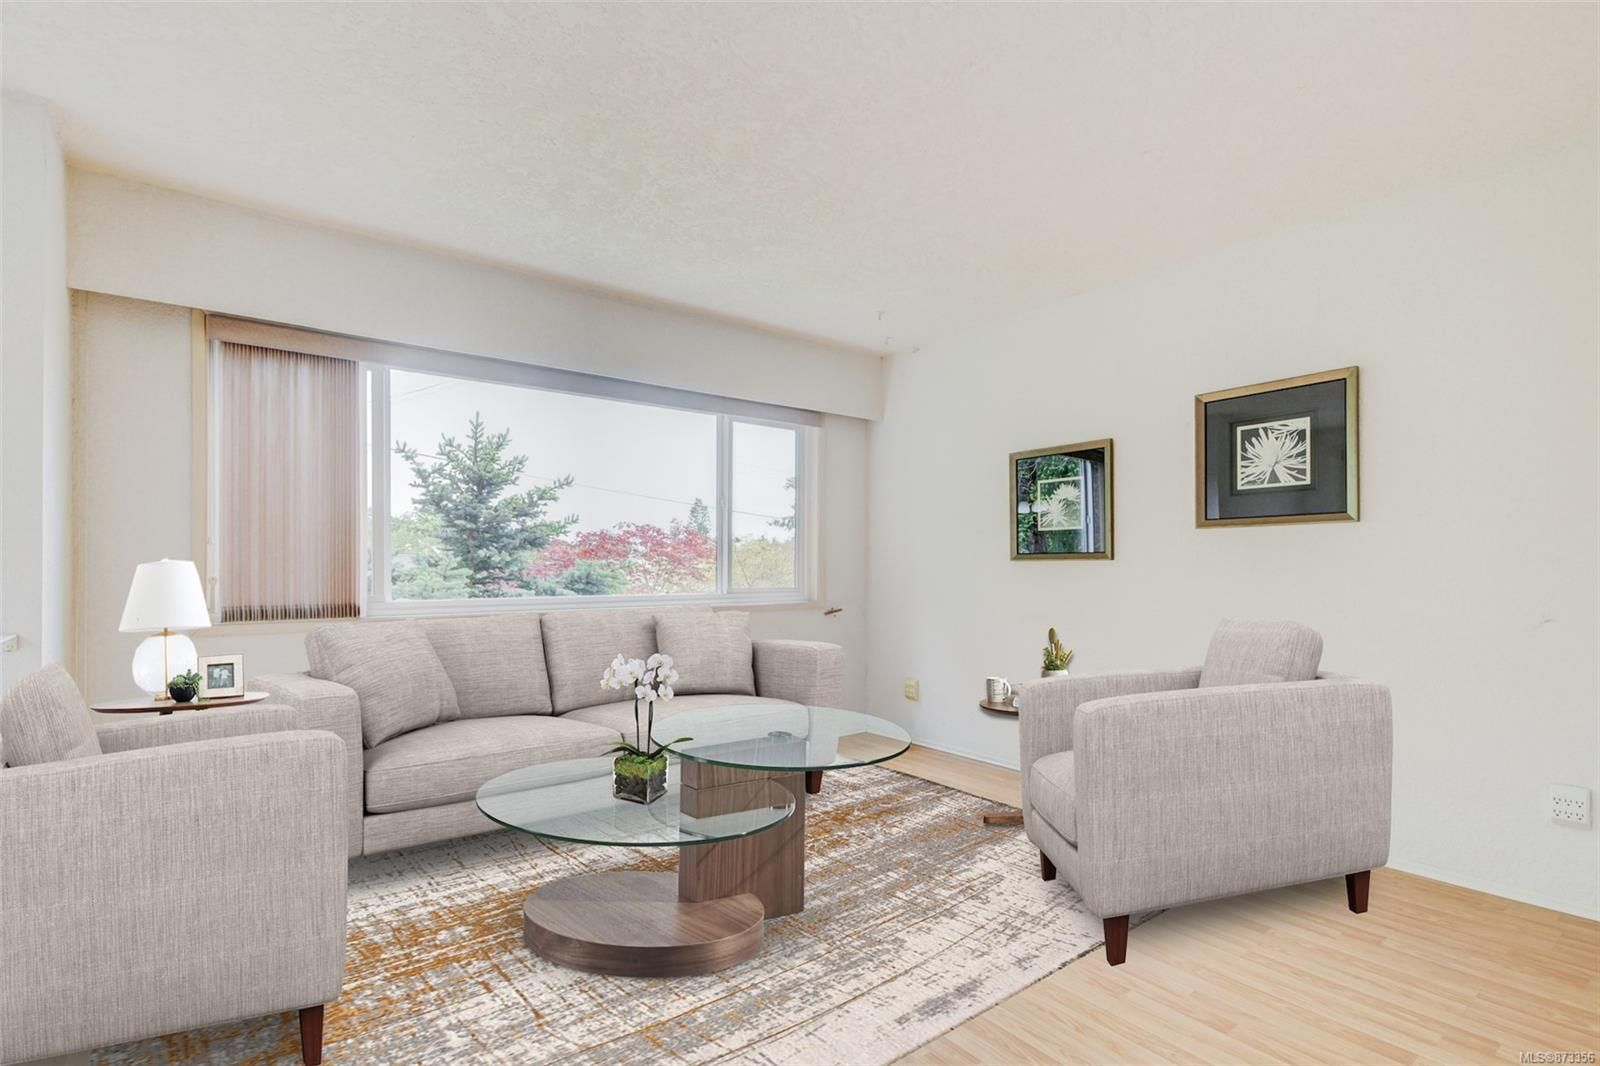 Main Photo: 700 Daisy Ave in : SW Marigold Half Duplex for sale (Saanich West)  : MLS®# 873356